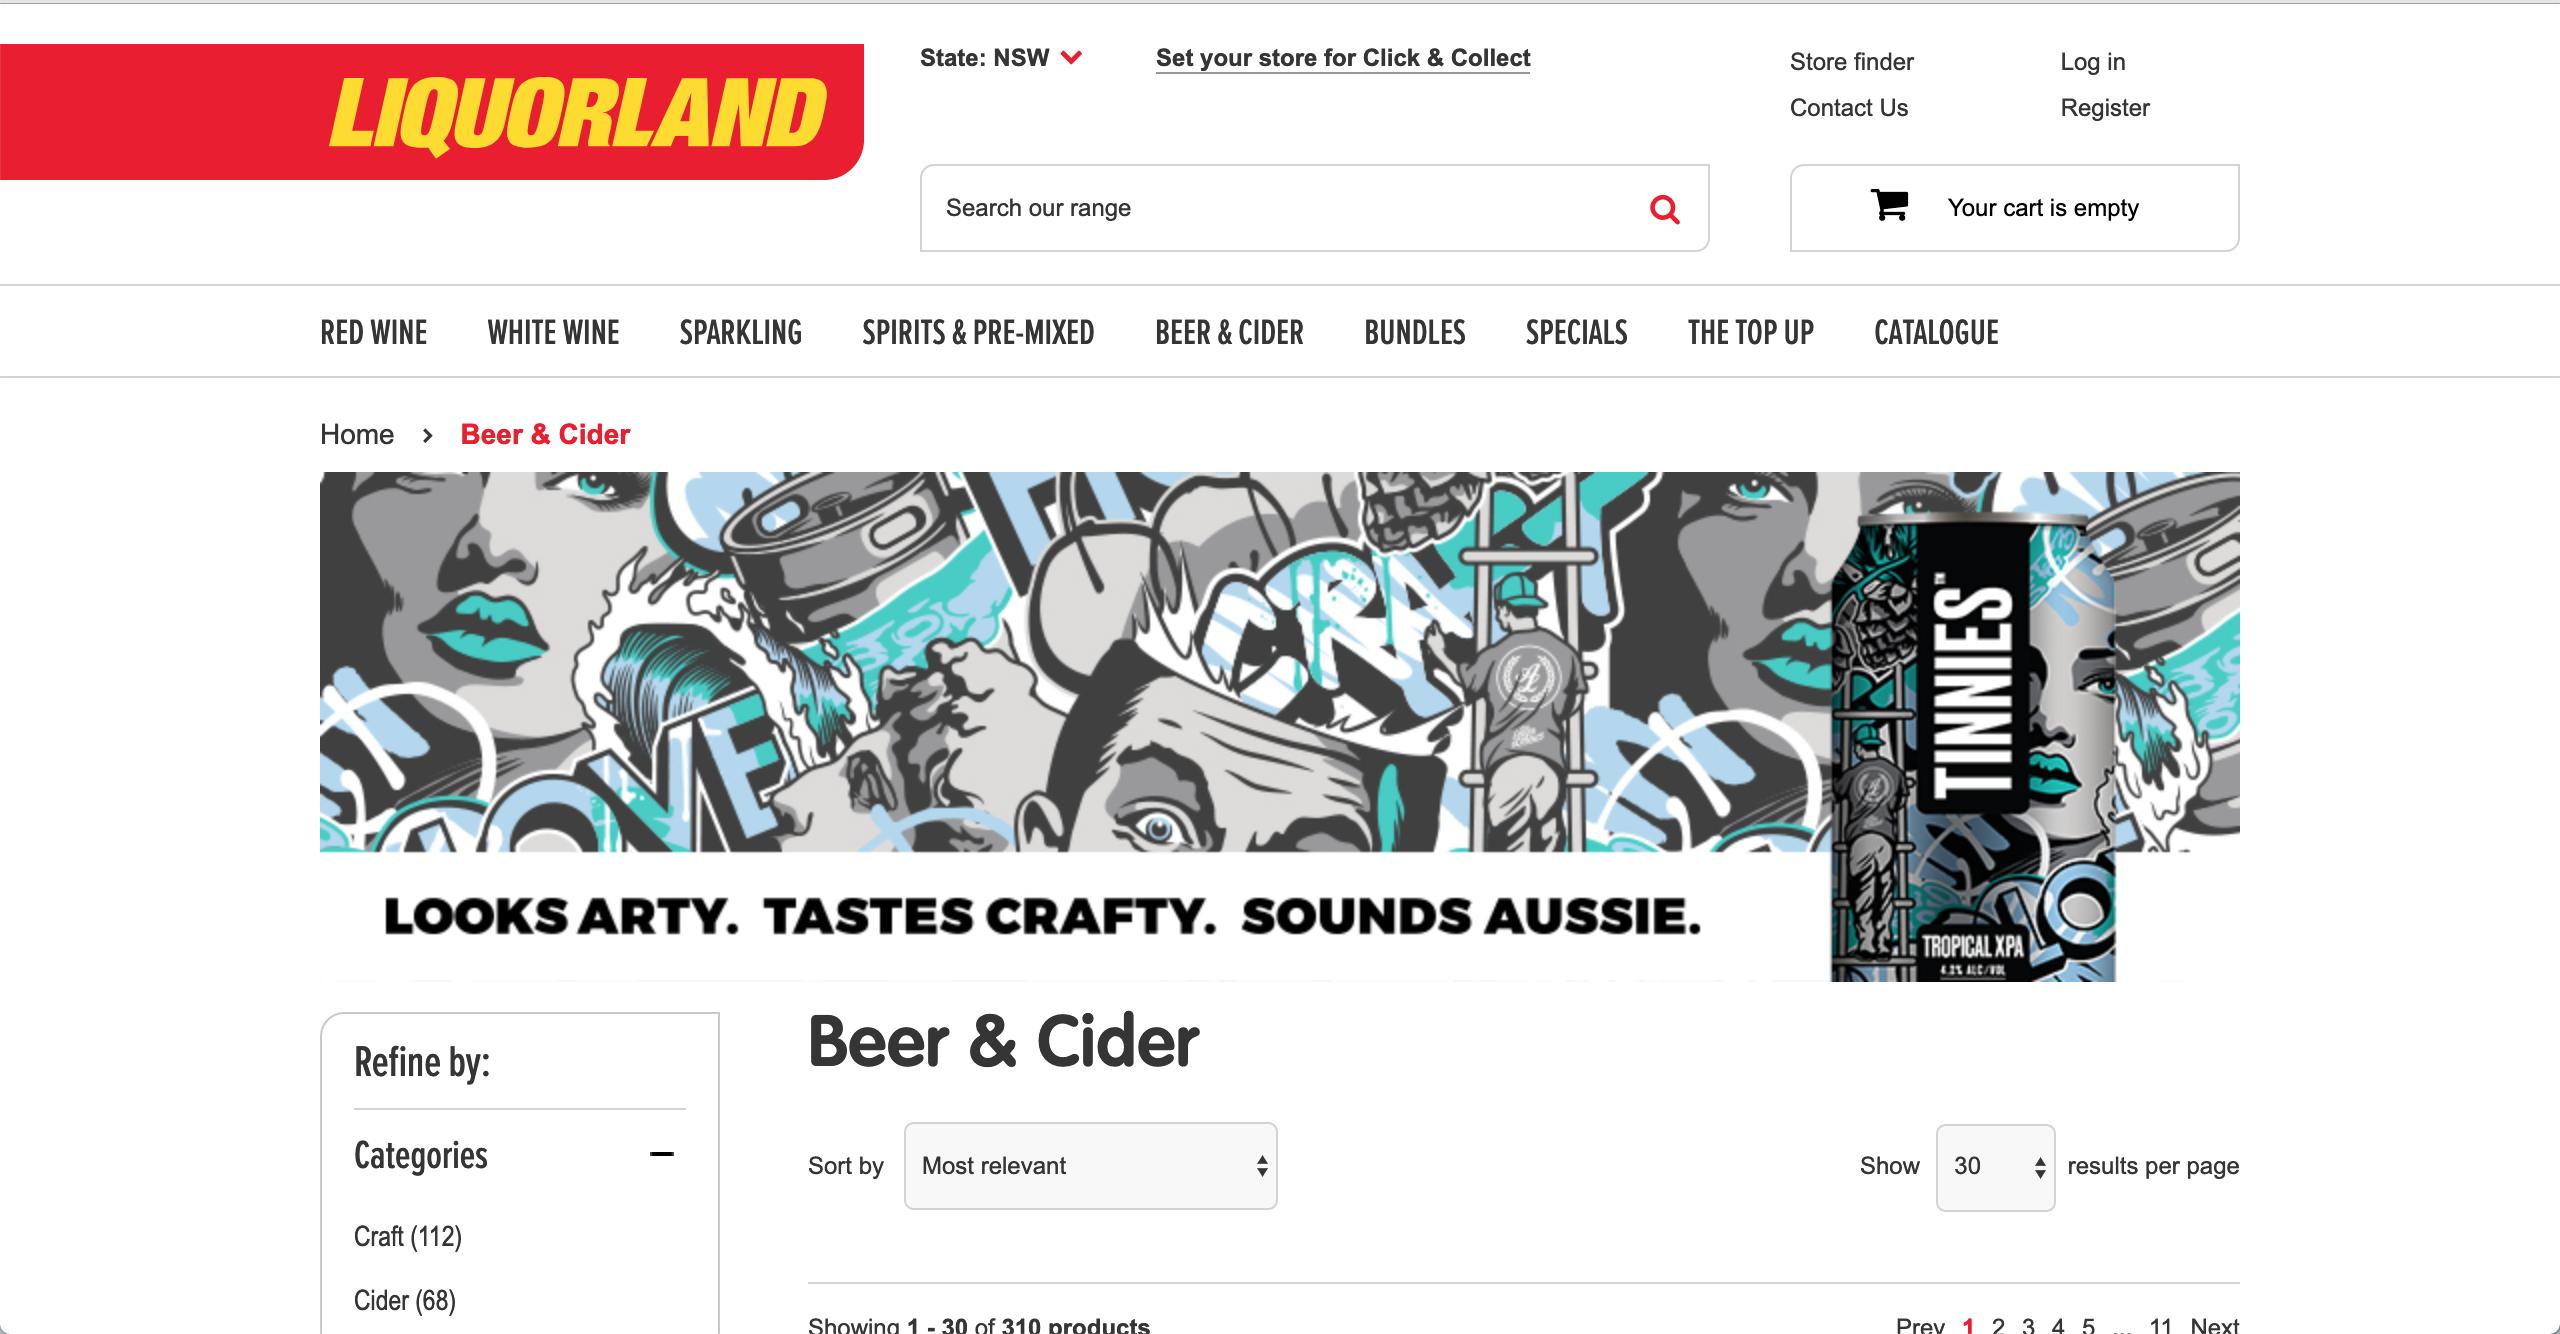 Liquorland Beer & Cider